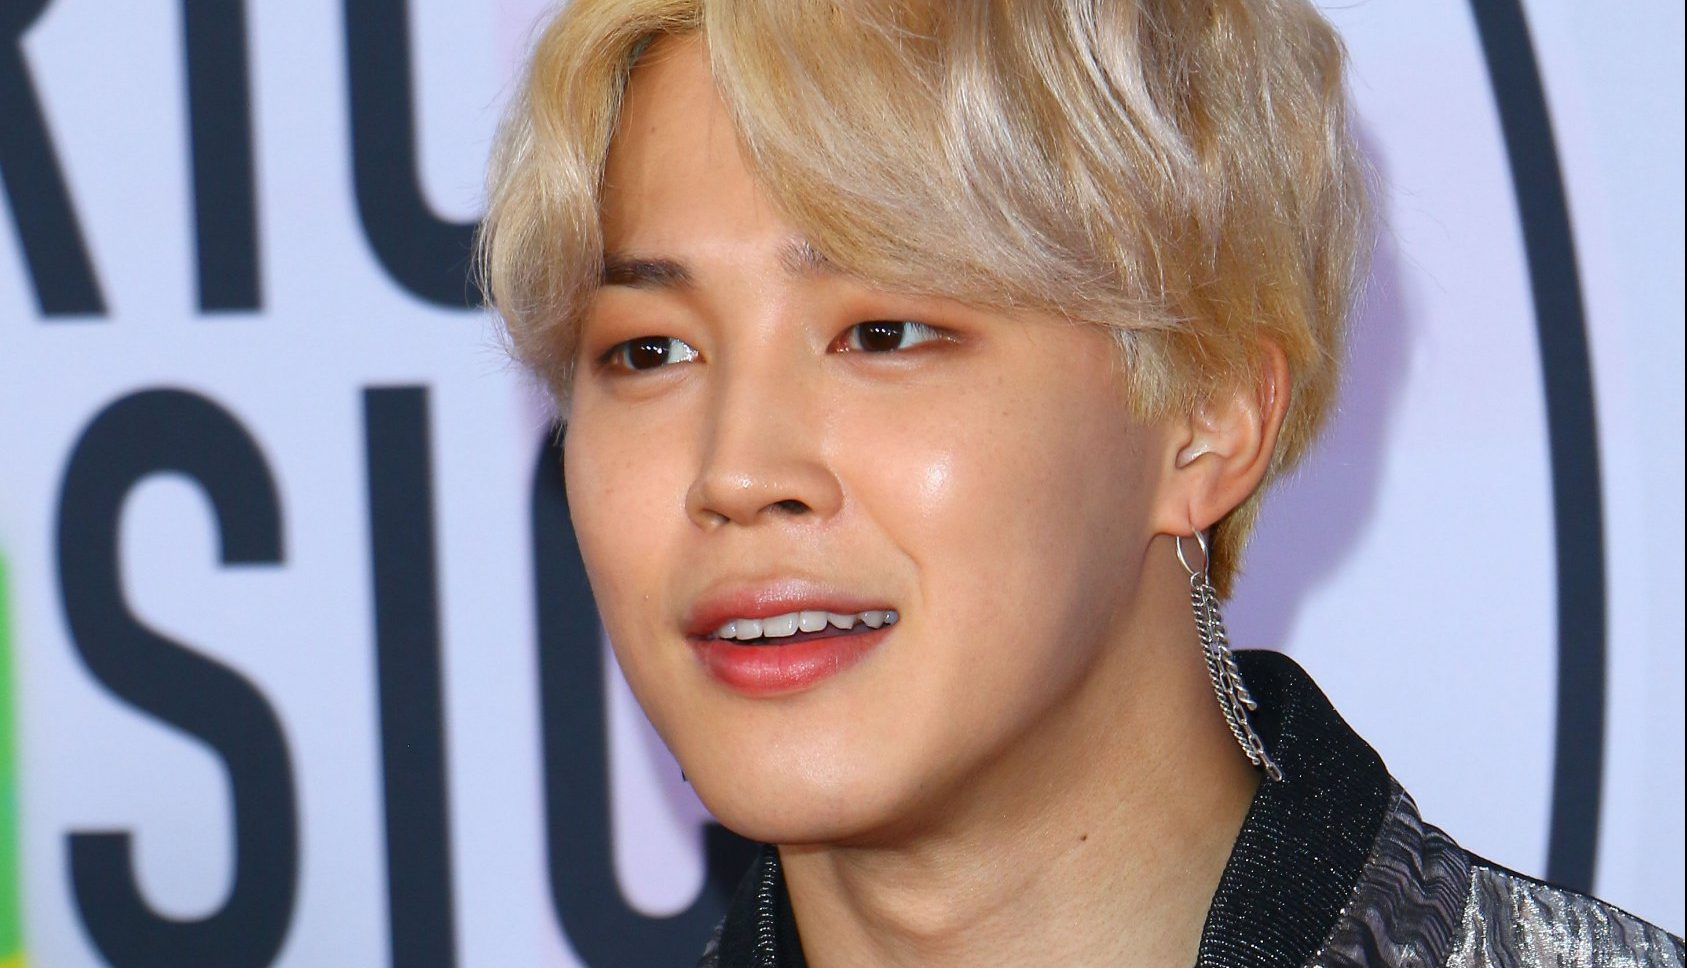 Mandatory Credit: Photo by Capture Pix/REX/Shutterstock (9229244ba) BTS - Jimin American Music Awards, Arrivals, Los Angeles, USA - 19 Nov 2017